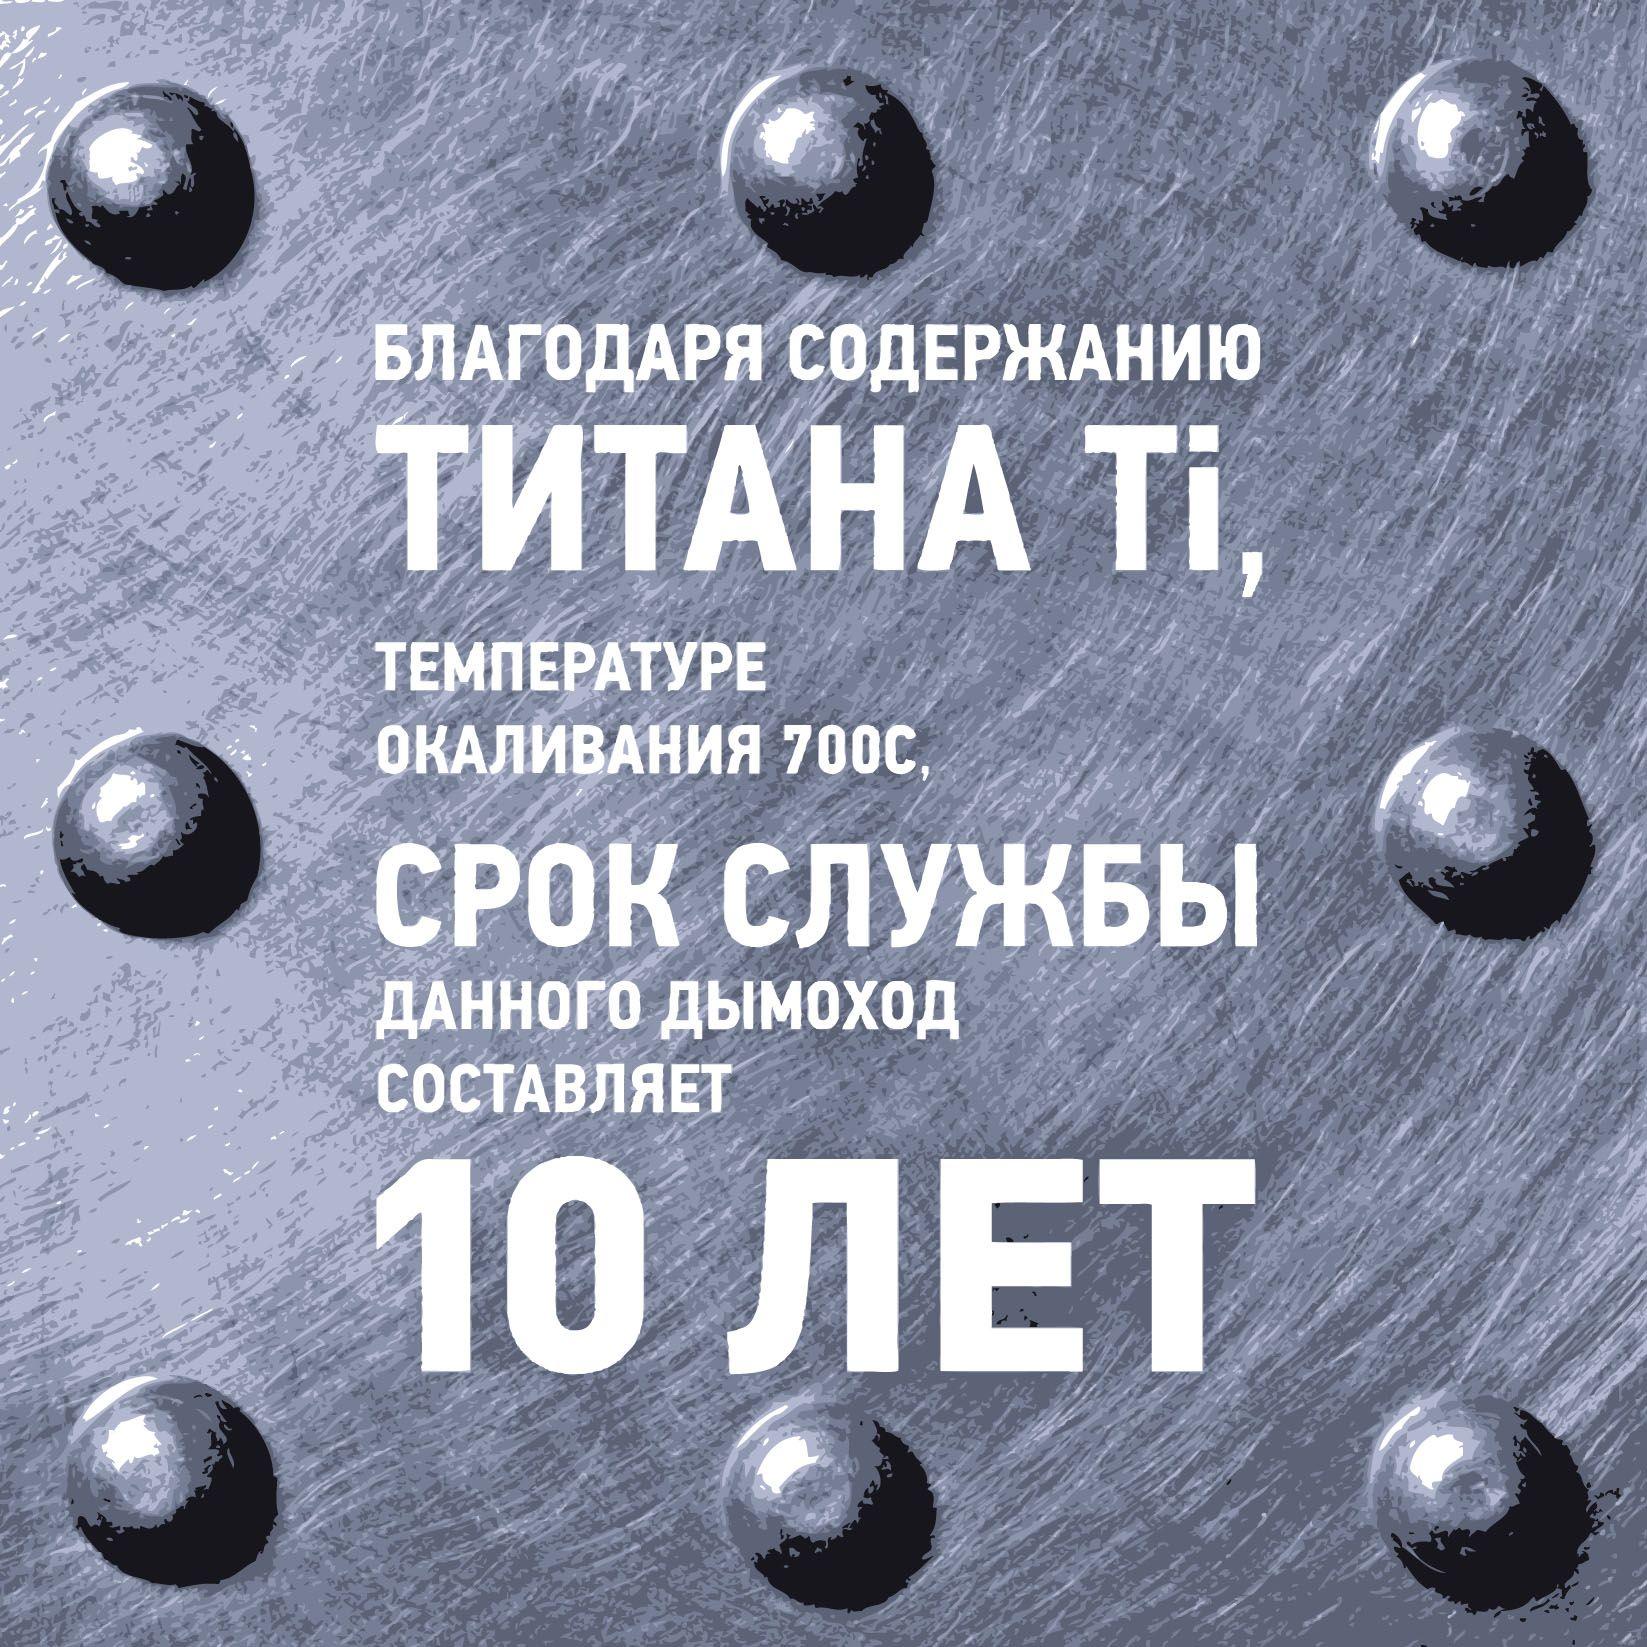 Наклейка на дымоход - дизайнер andblin61